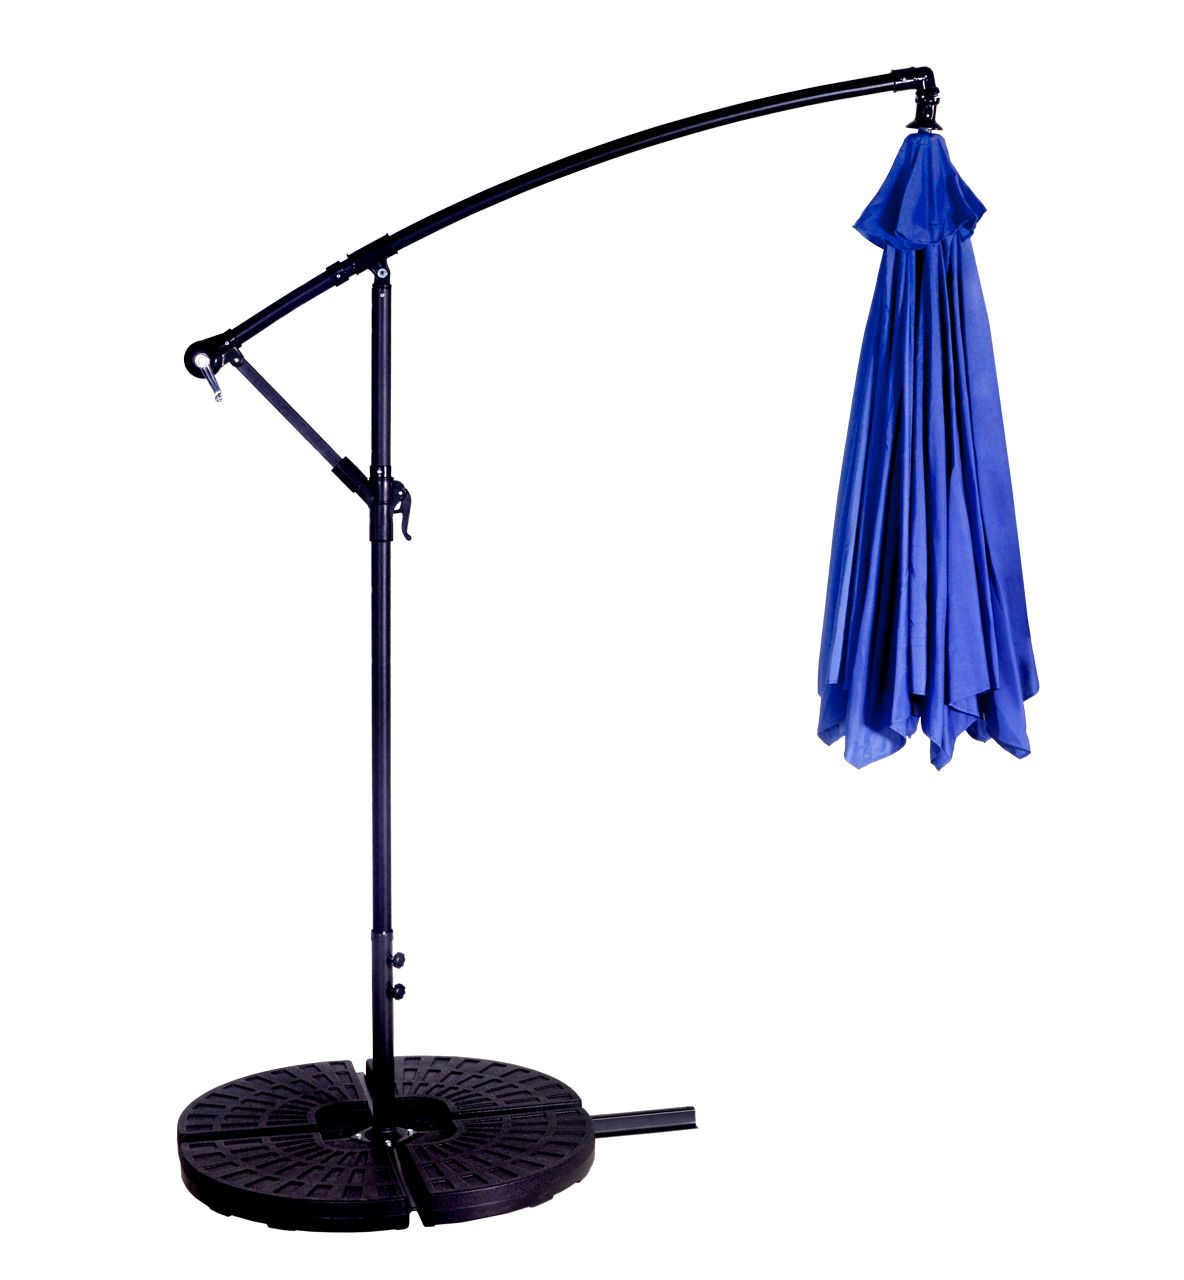 Ultraclor Ombrelone Garden Hanging 3,00 Metros - Completo Com Peso